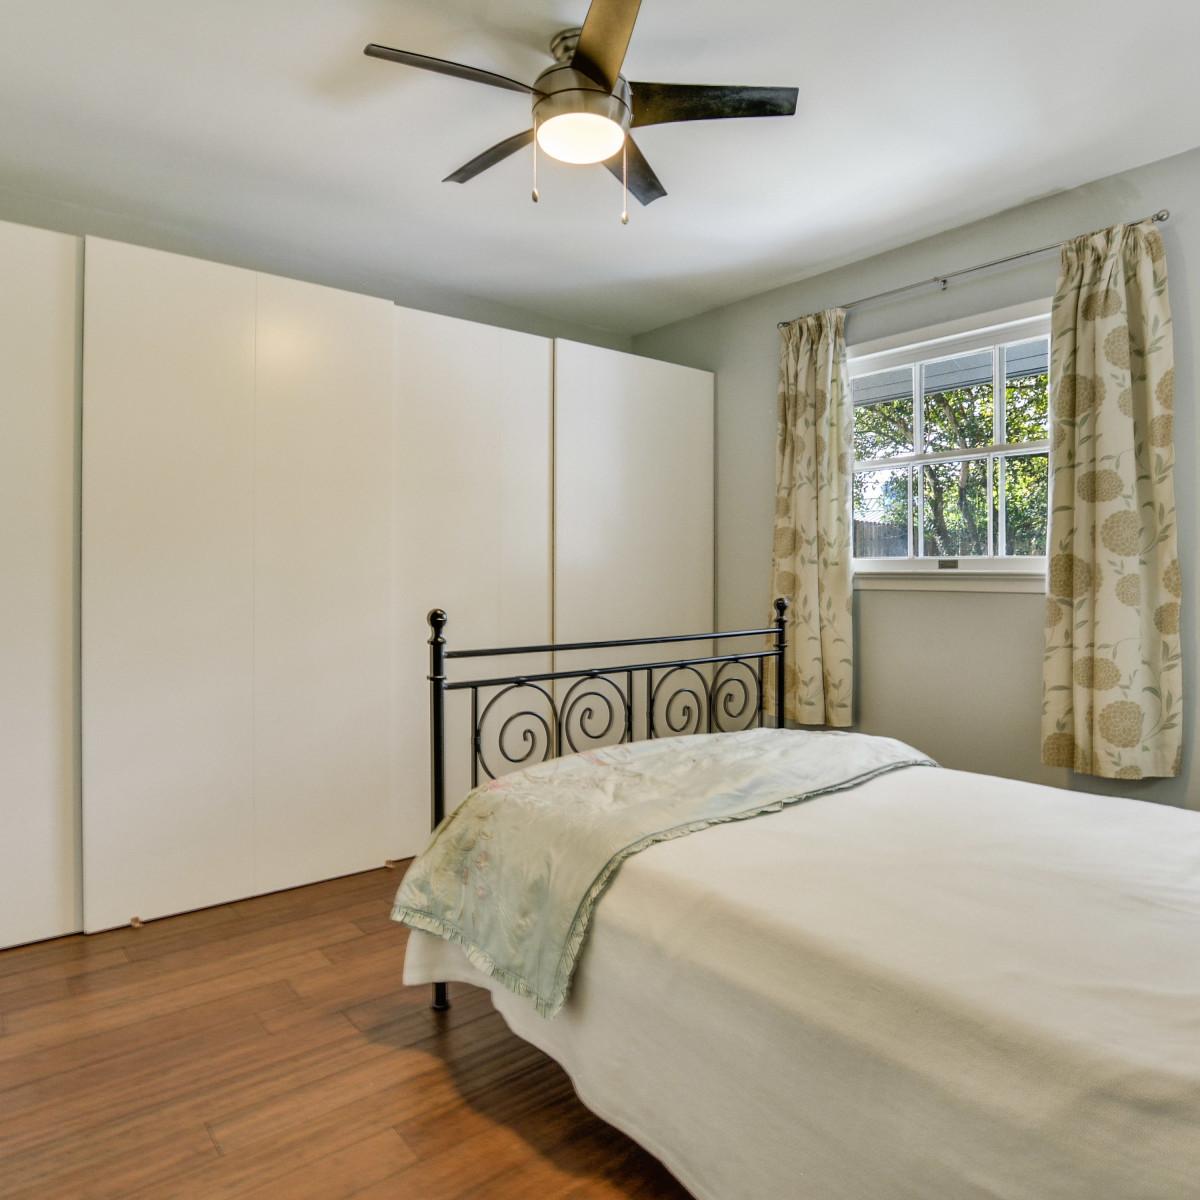 231 Hillview San Antonio house for sale bedroom